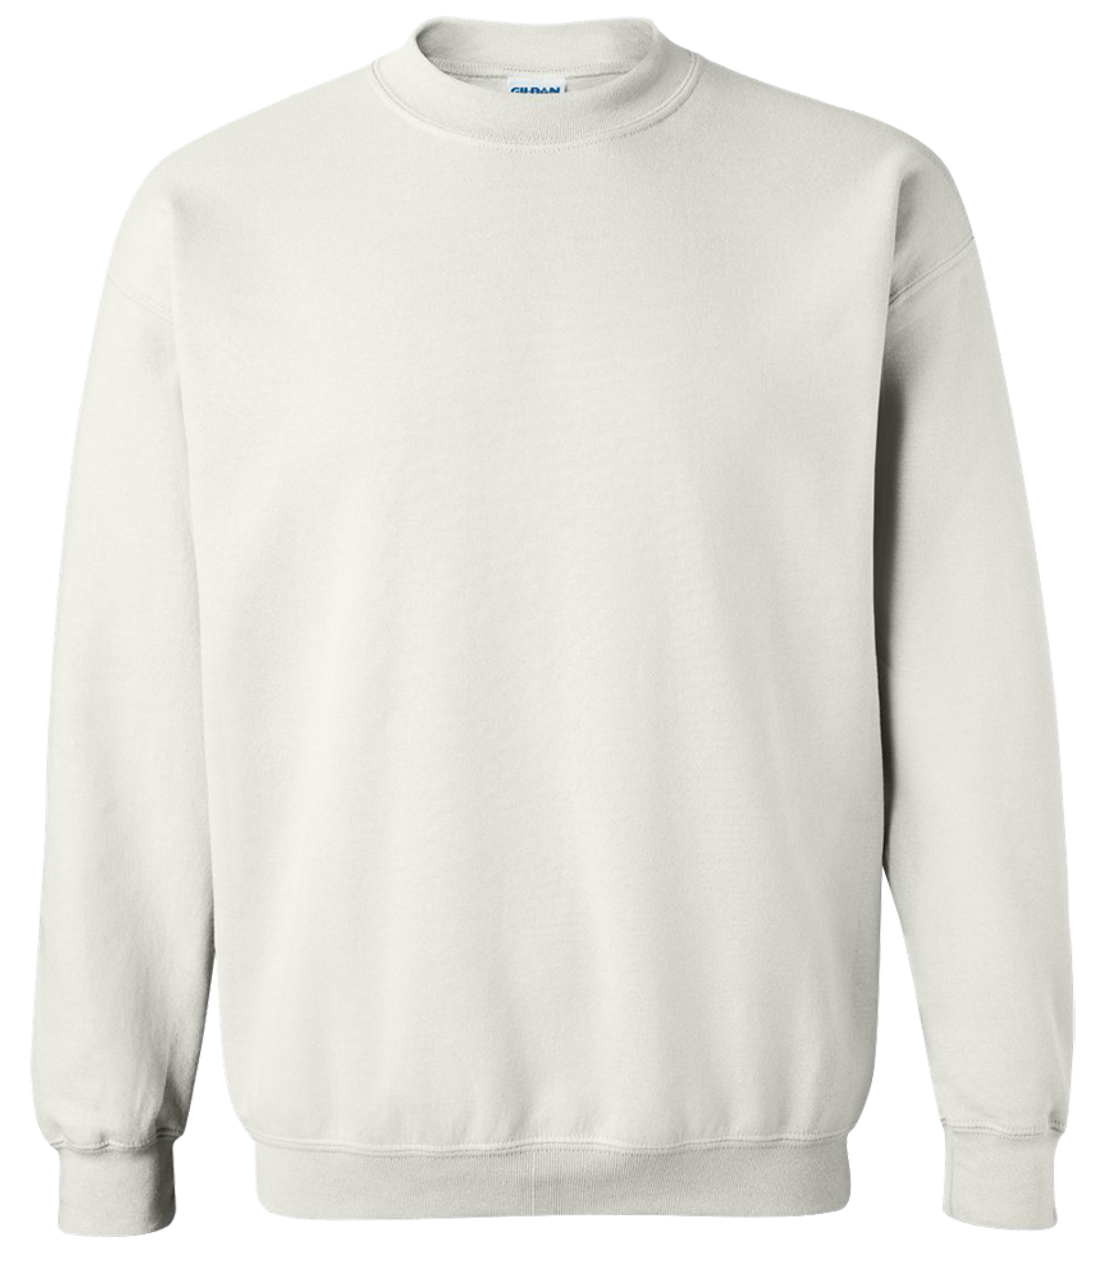 G18000 in White